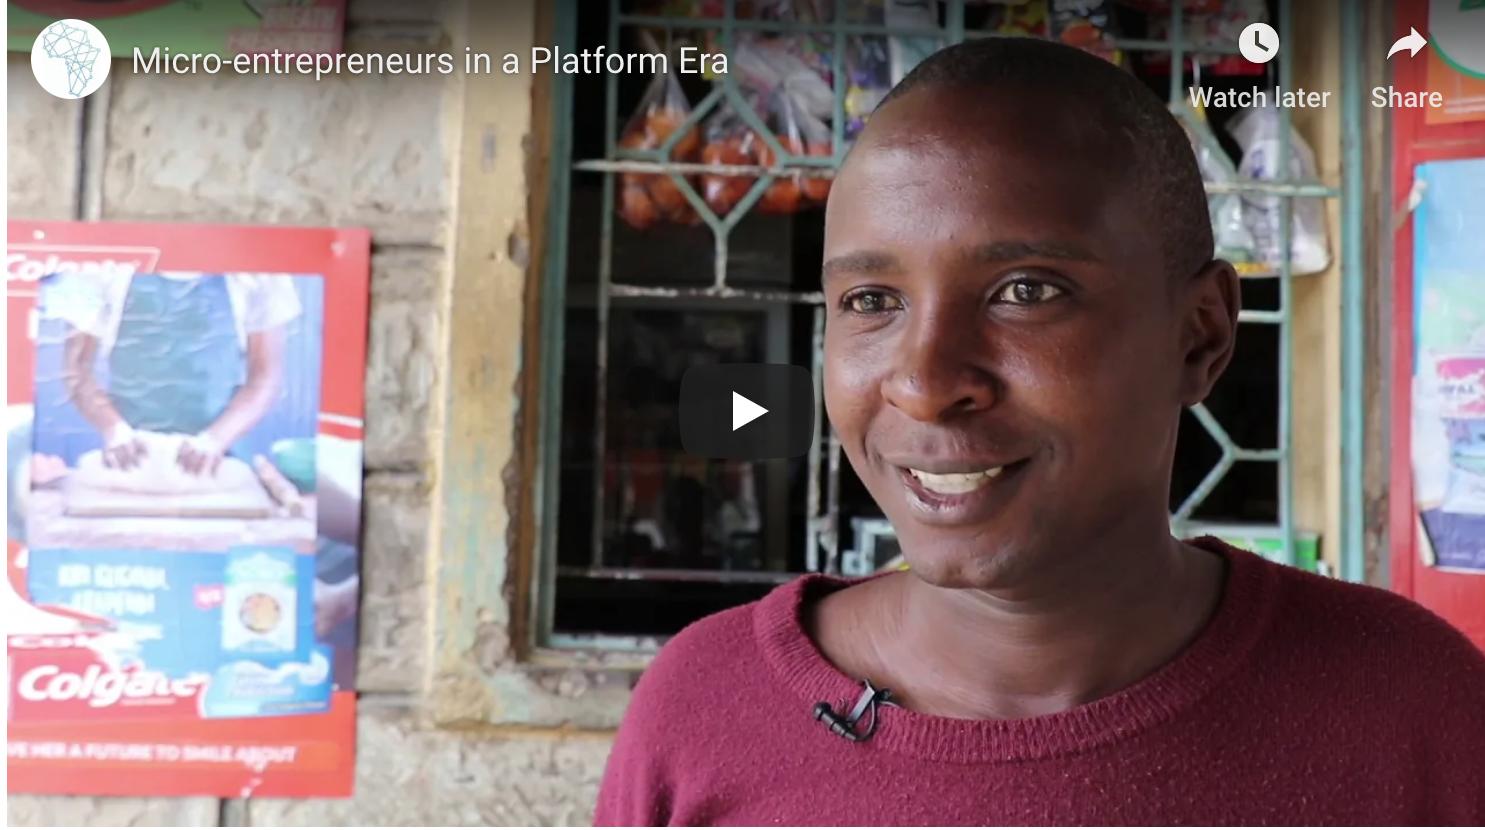 Understanding the platform practises of micro-entrepreneurs in Kenya: Mastercard Foundation (image)